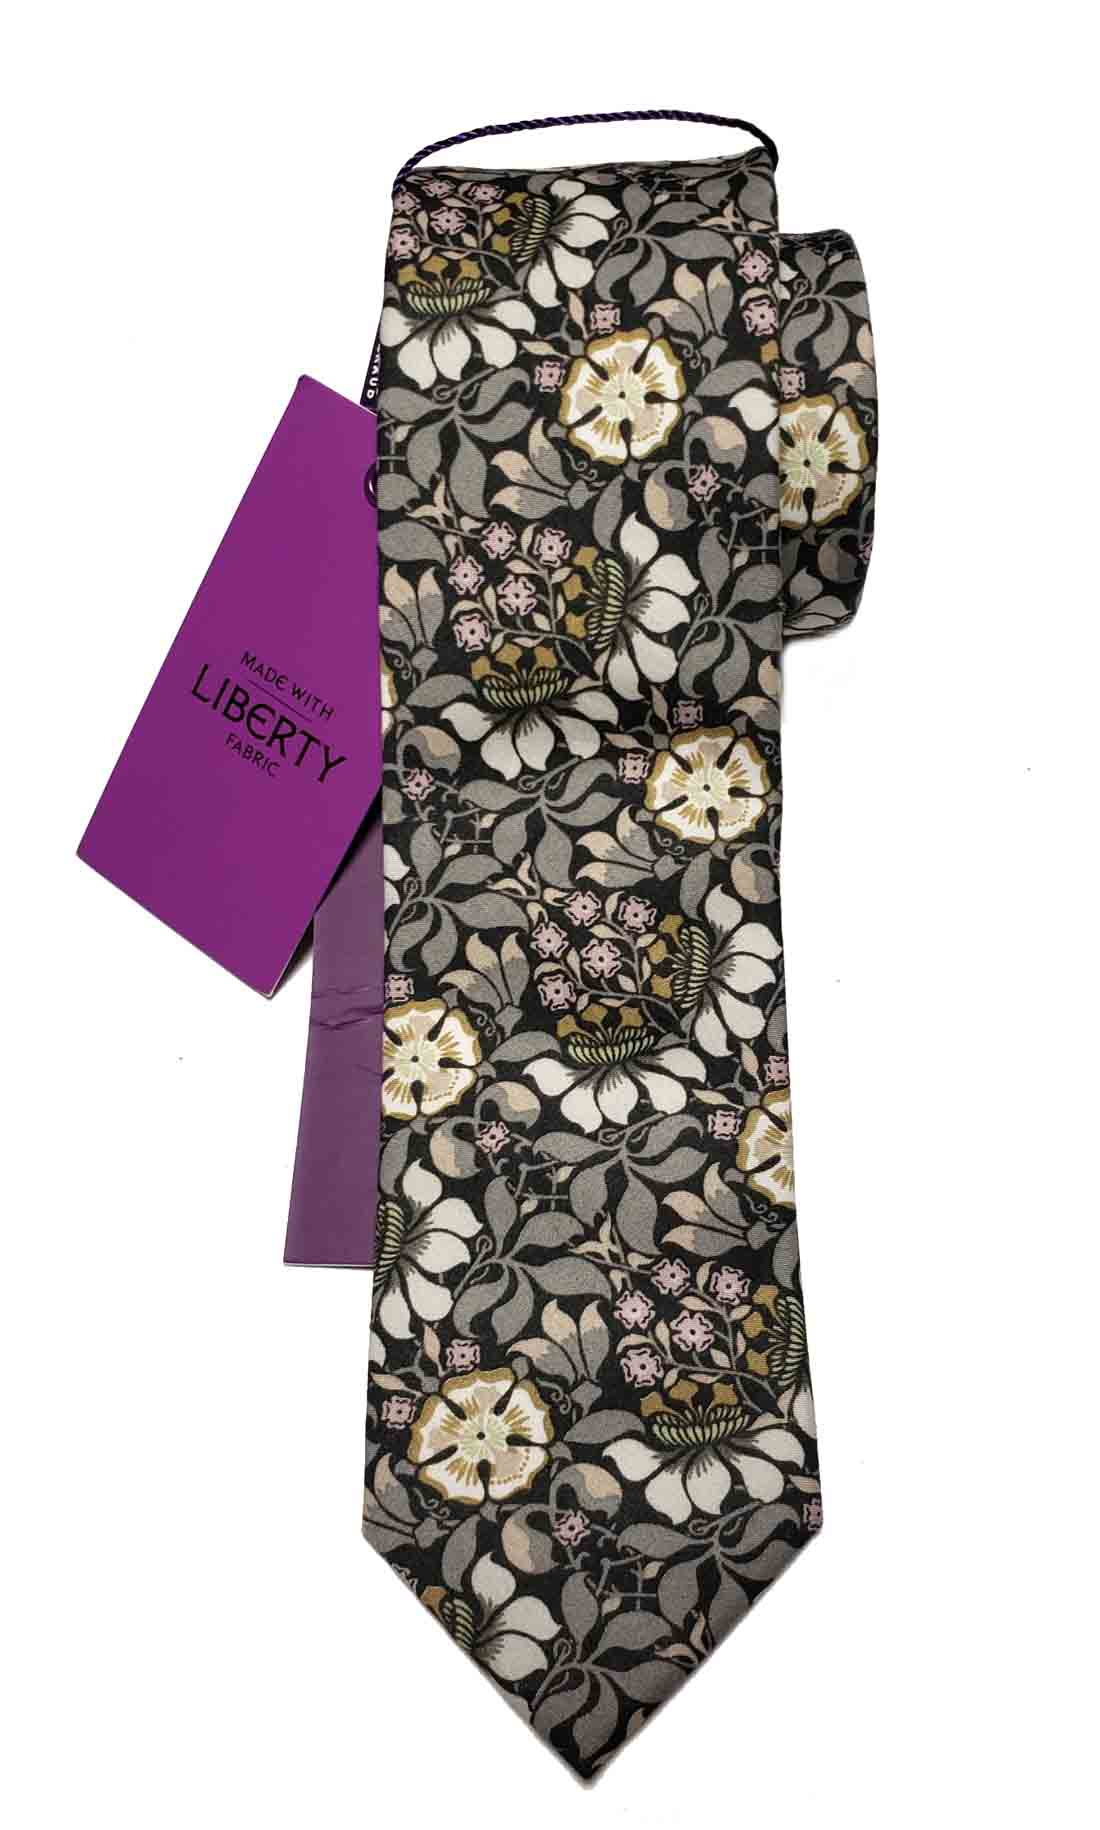 Gianni Feraud Liberty of London Fabric Tie Floral Gray Black Pink Cotton Men's Long Slim Tie